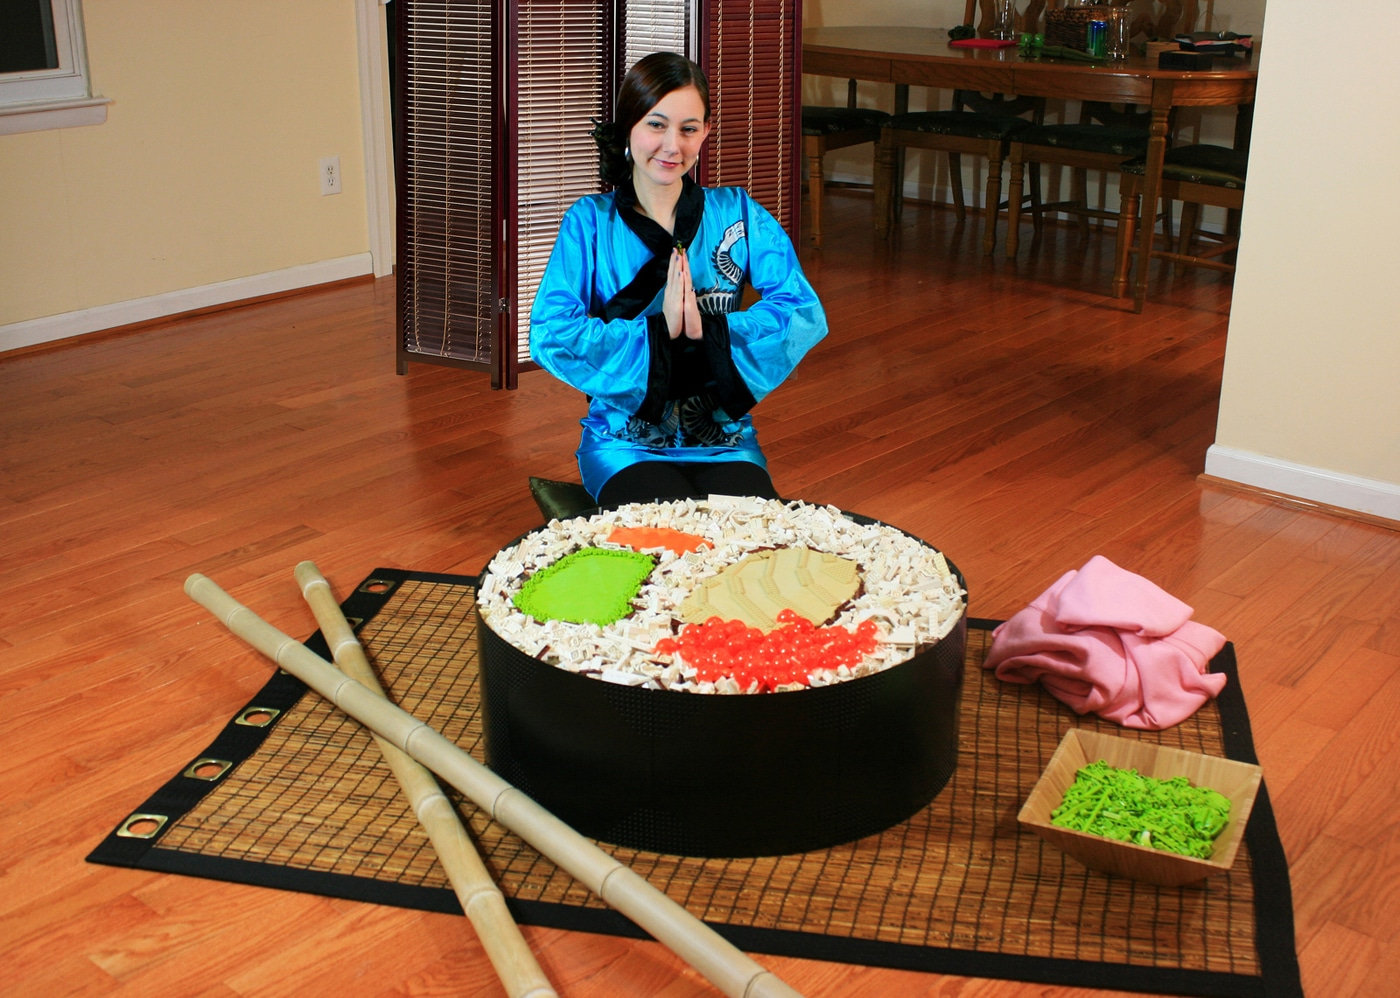 LEGO Sushi: One Giant Sushi Roll Created Entirely From LEGO